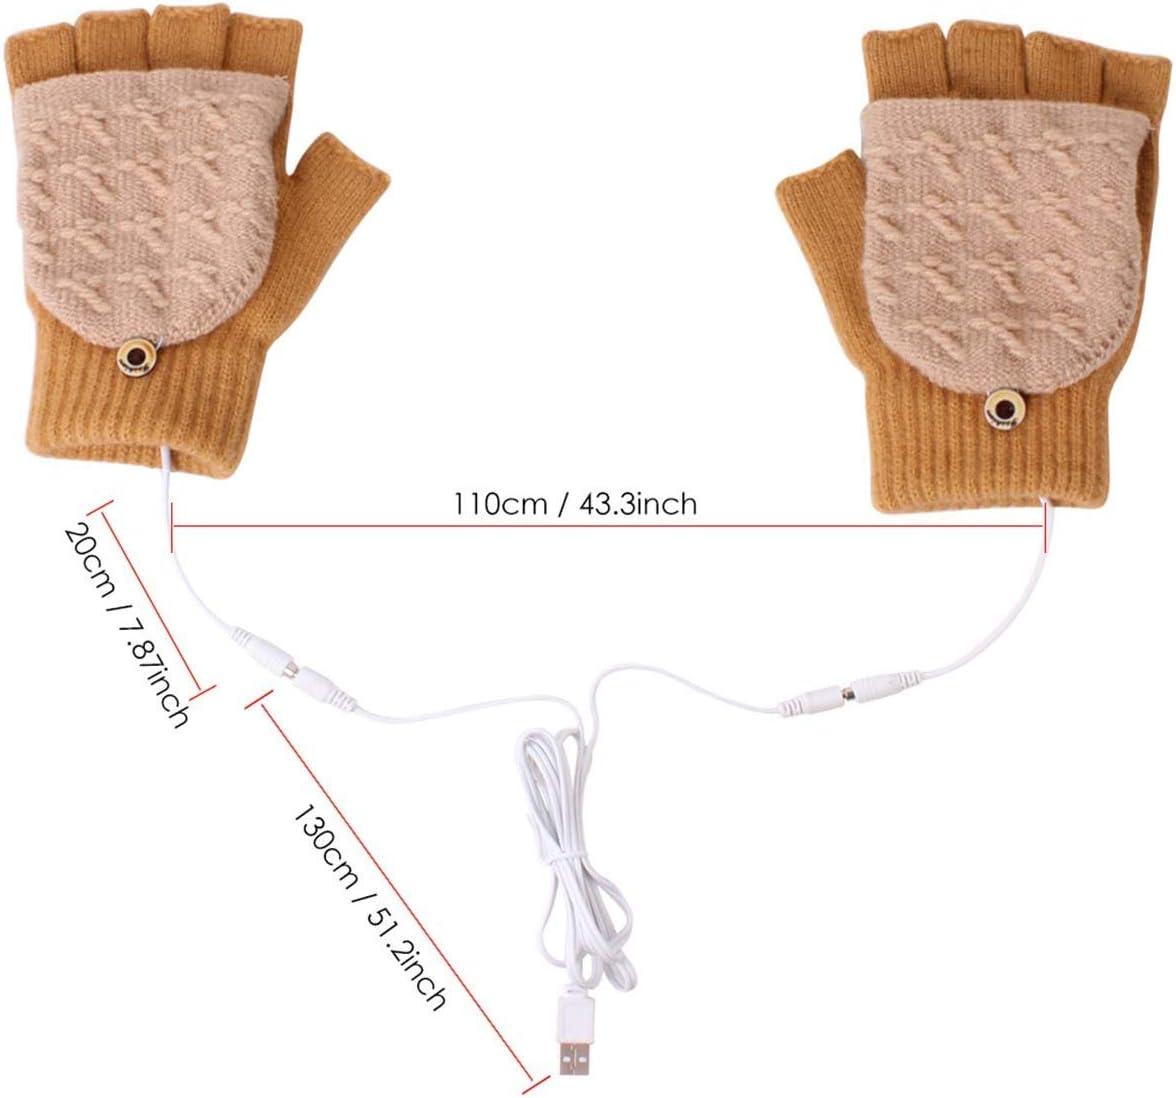 USB Heated Gloves Winter Knitted Warm Gloves Full Half Finger Heated Gloves Mitten Best Winter Gift Choice for Women